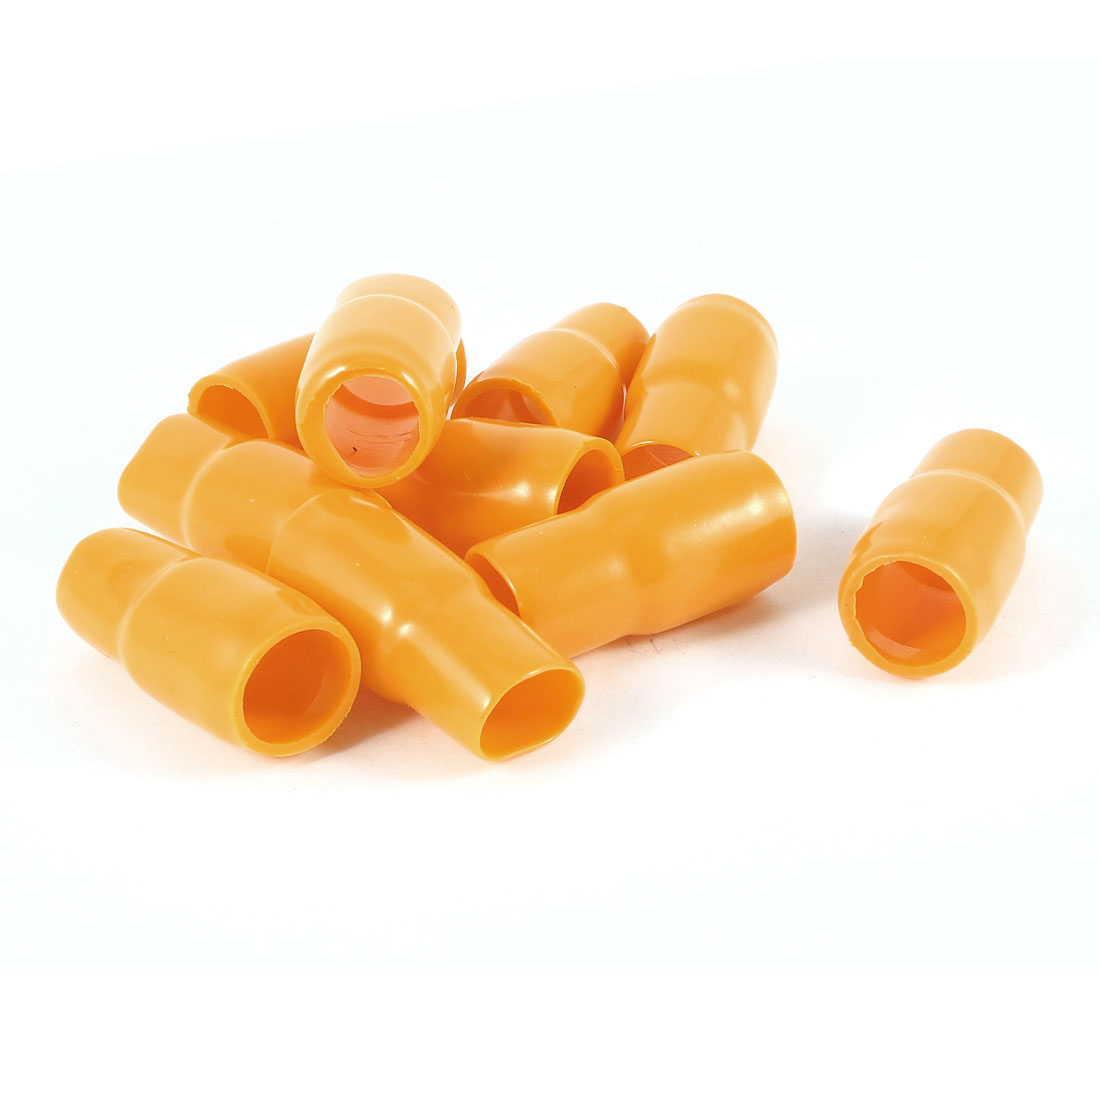 10 Pcs Orange Soft PVC Wire V-38 35mm2 Crimp V Terminal End Insulated Sleeves Caps Cover